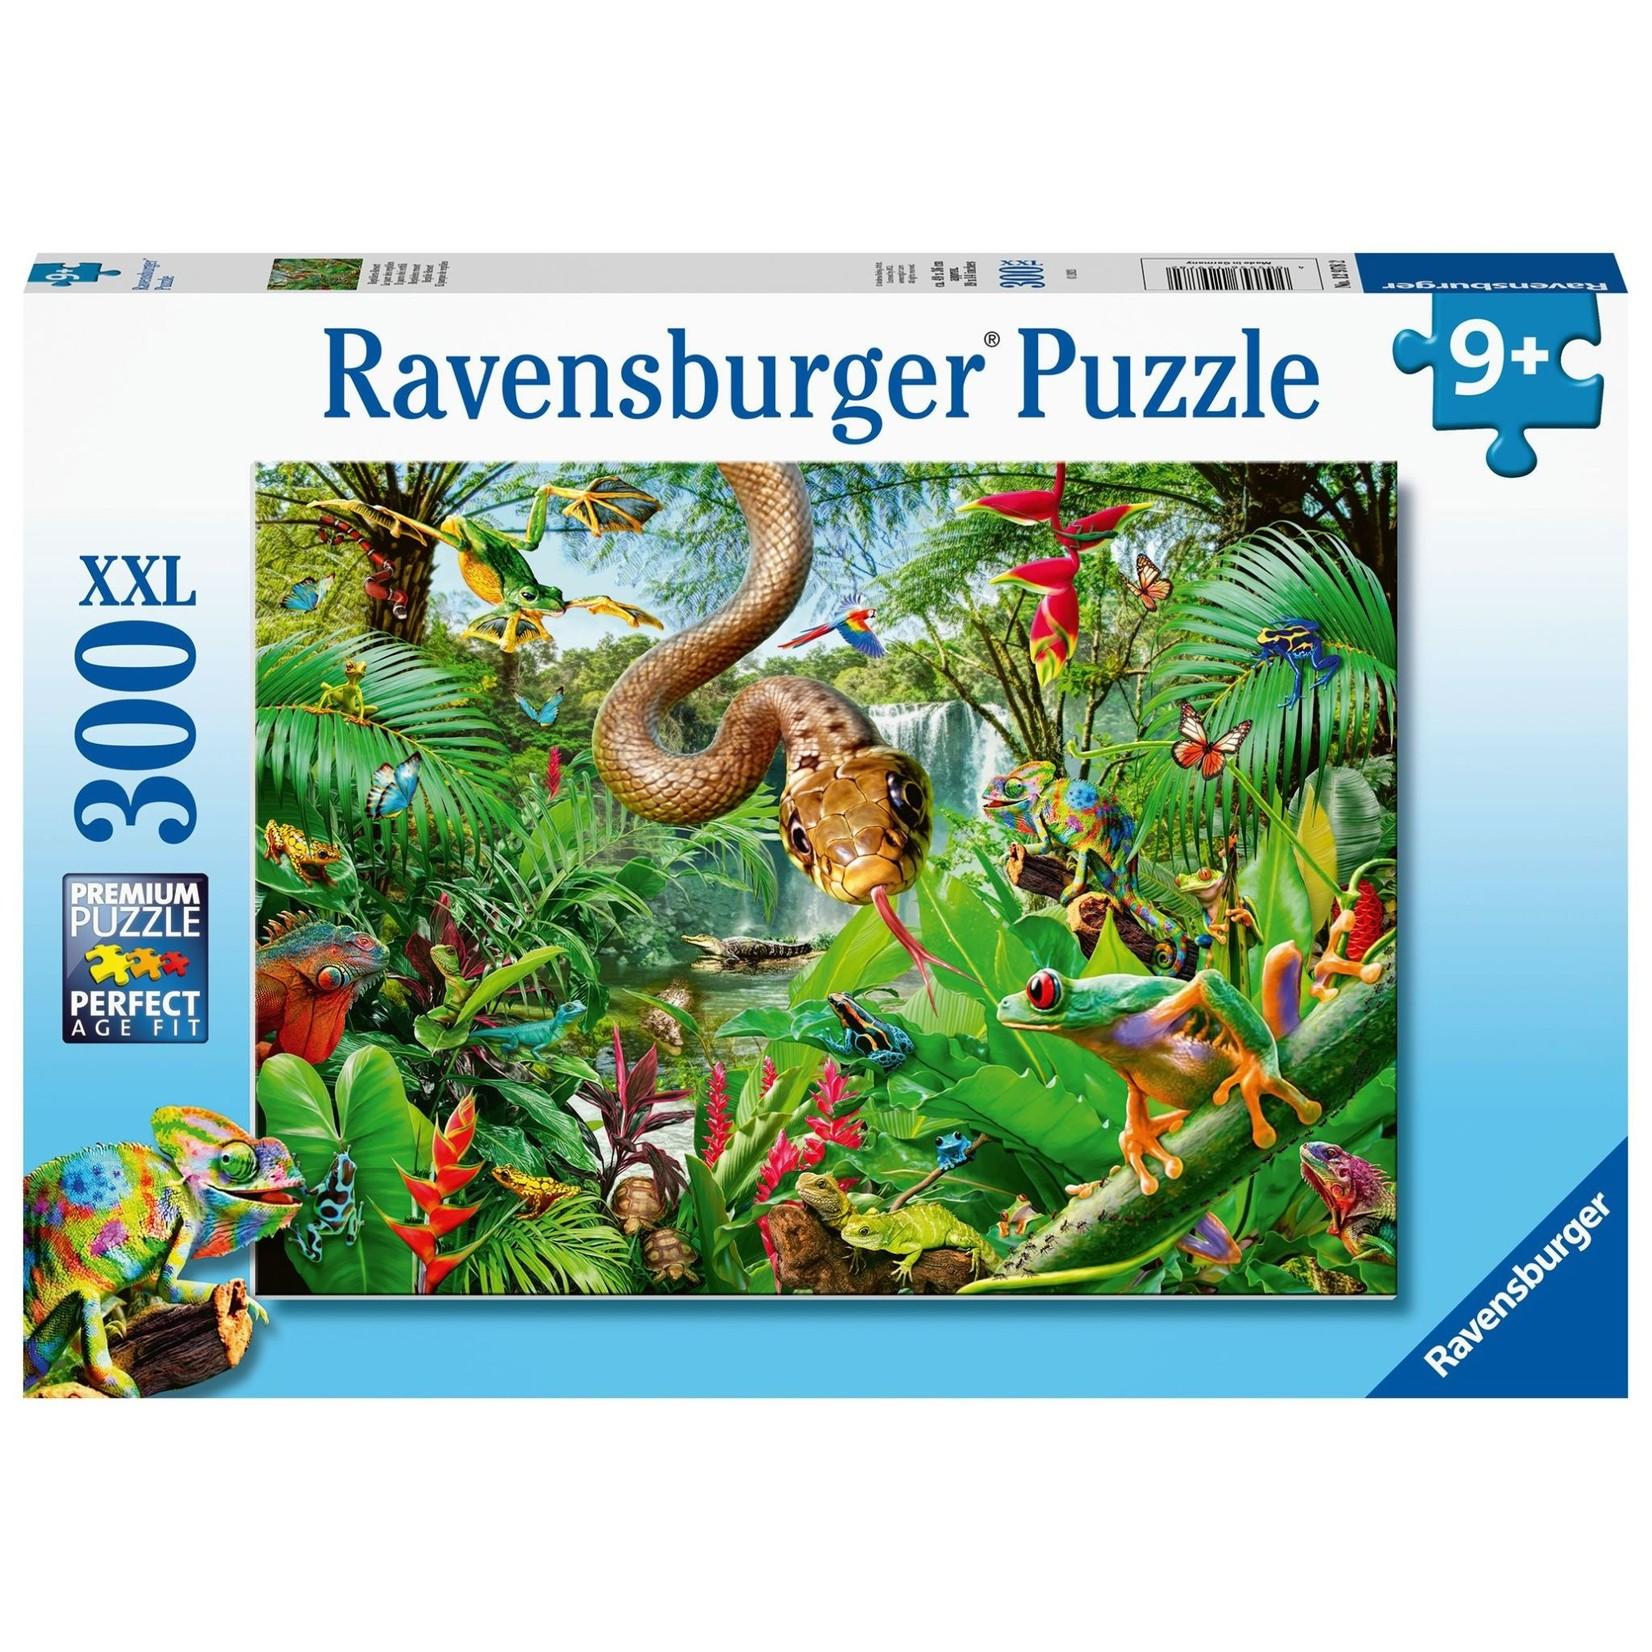 Ravensburger Reptile Resort 300pc